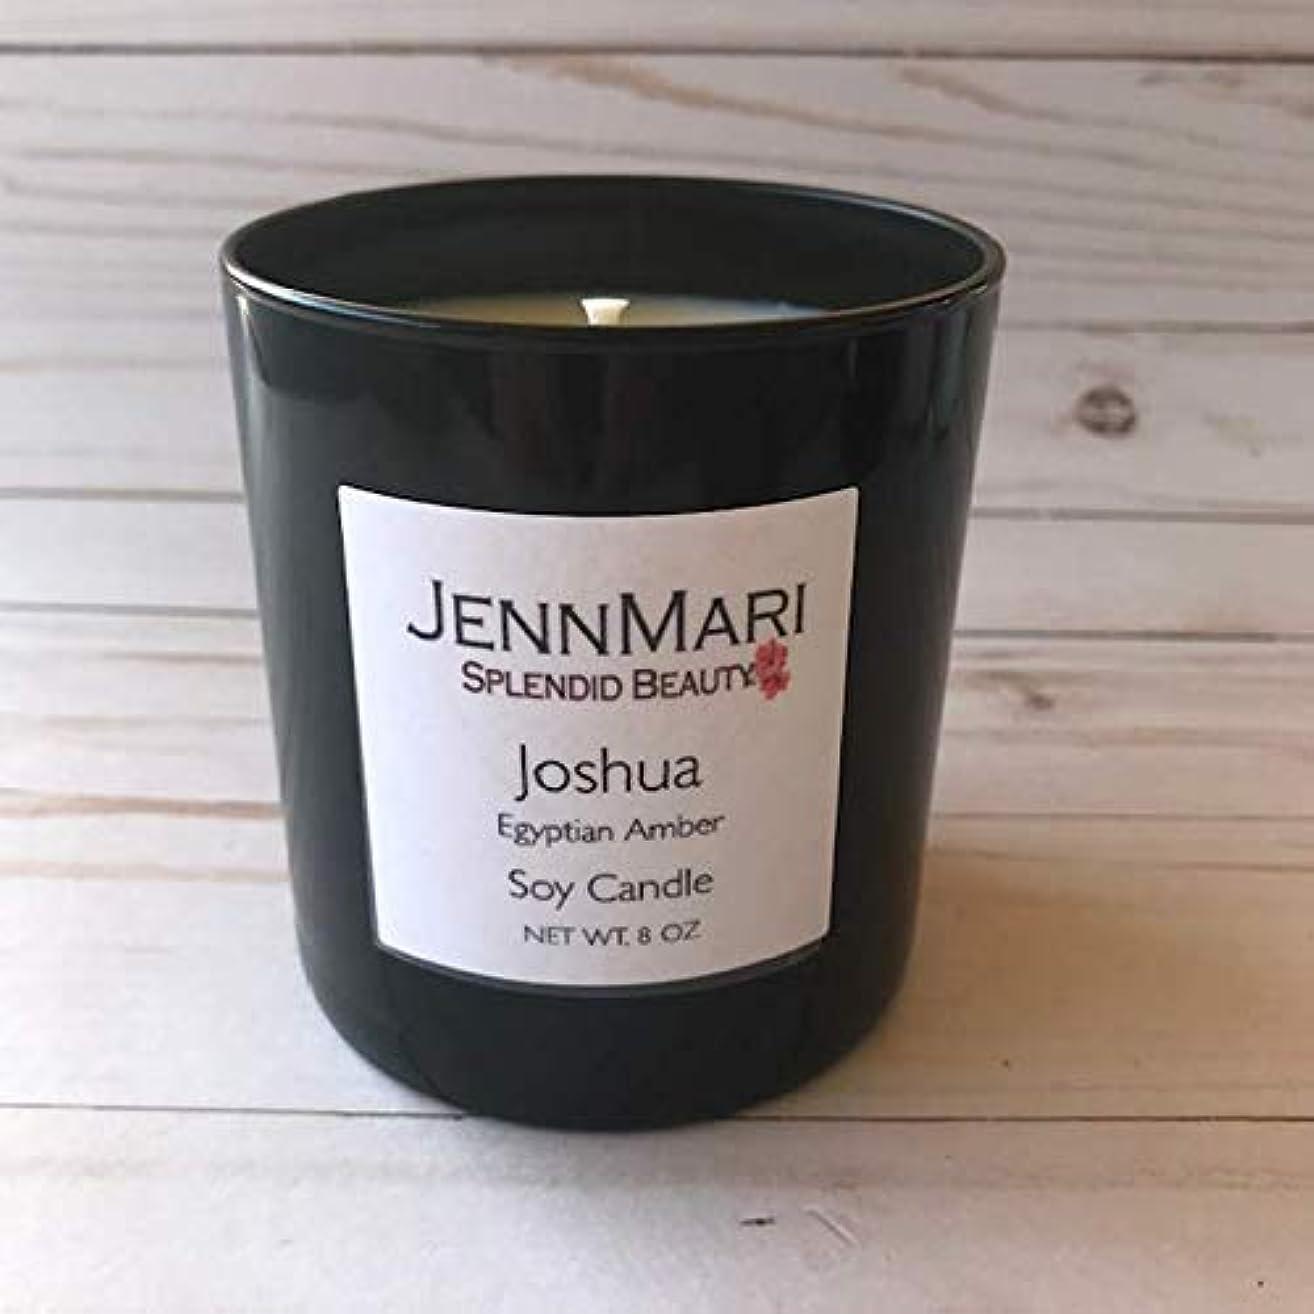 Splendid Beauty   Egyptian Amber Scented Soy Candle Glass Jar   10 Oz   Handmade   Eco-friendly   Vegan   Cotton Wick   100% Soy Wax